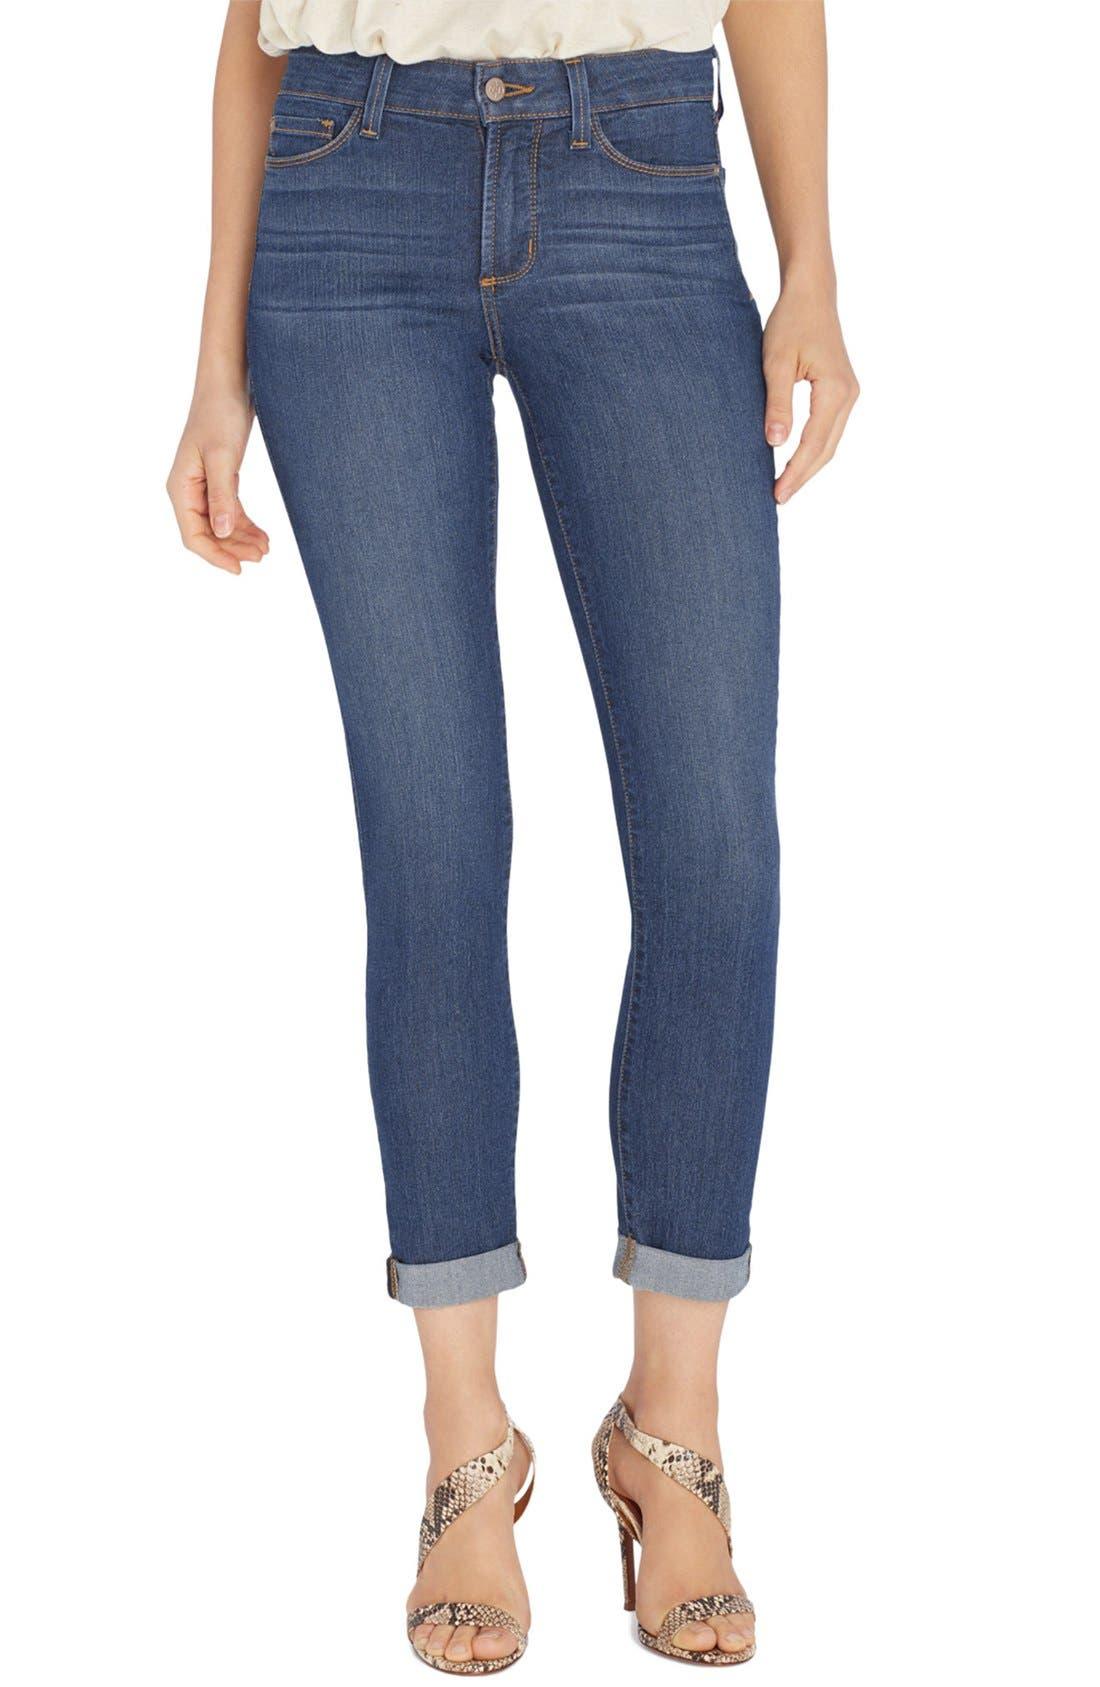 Main Image - NYDJ 'Annabelle' Stretch Boyfriend Jeans (Atlanta) (Regular & Petite)